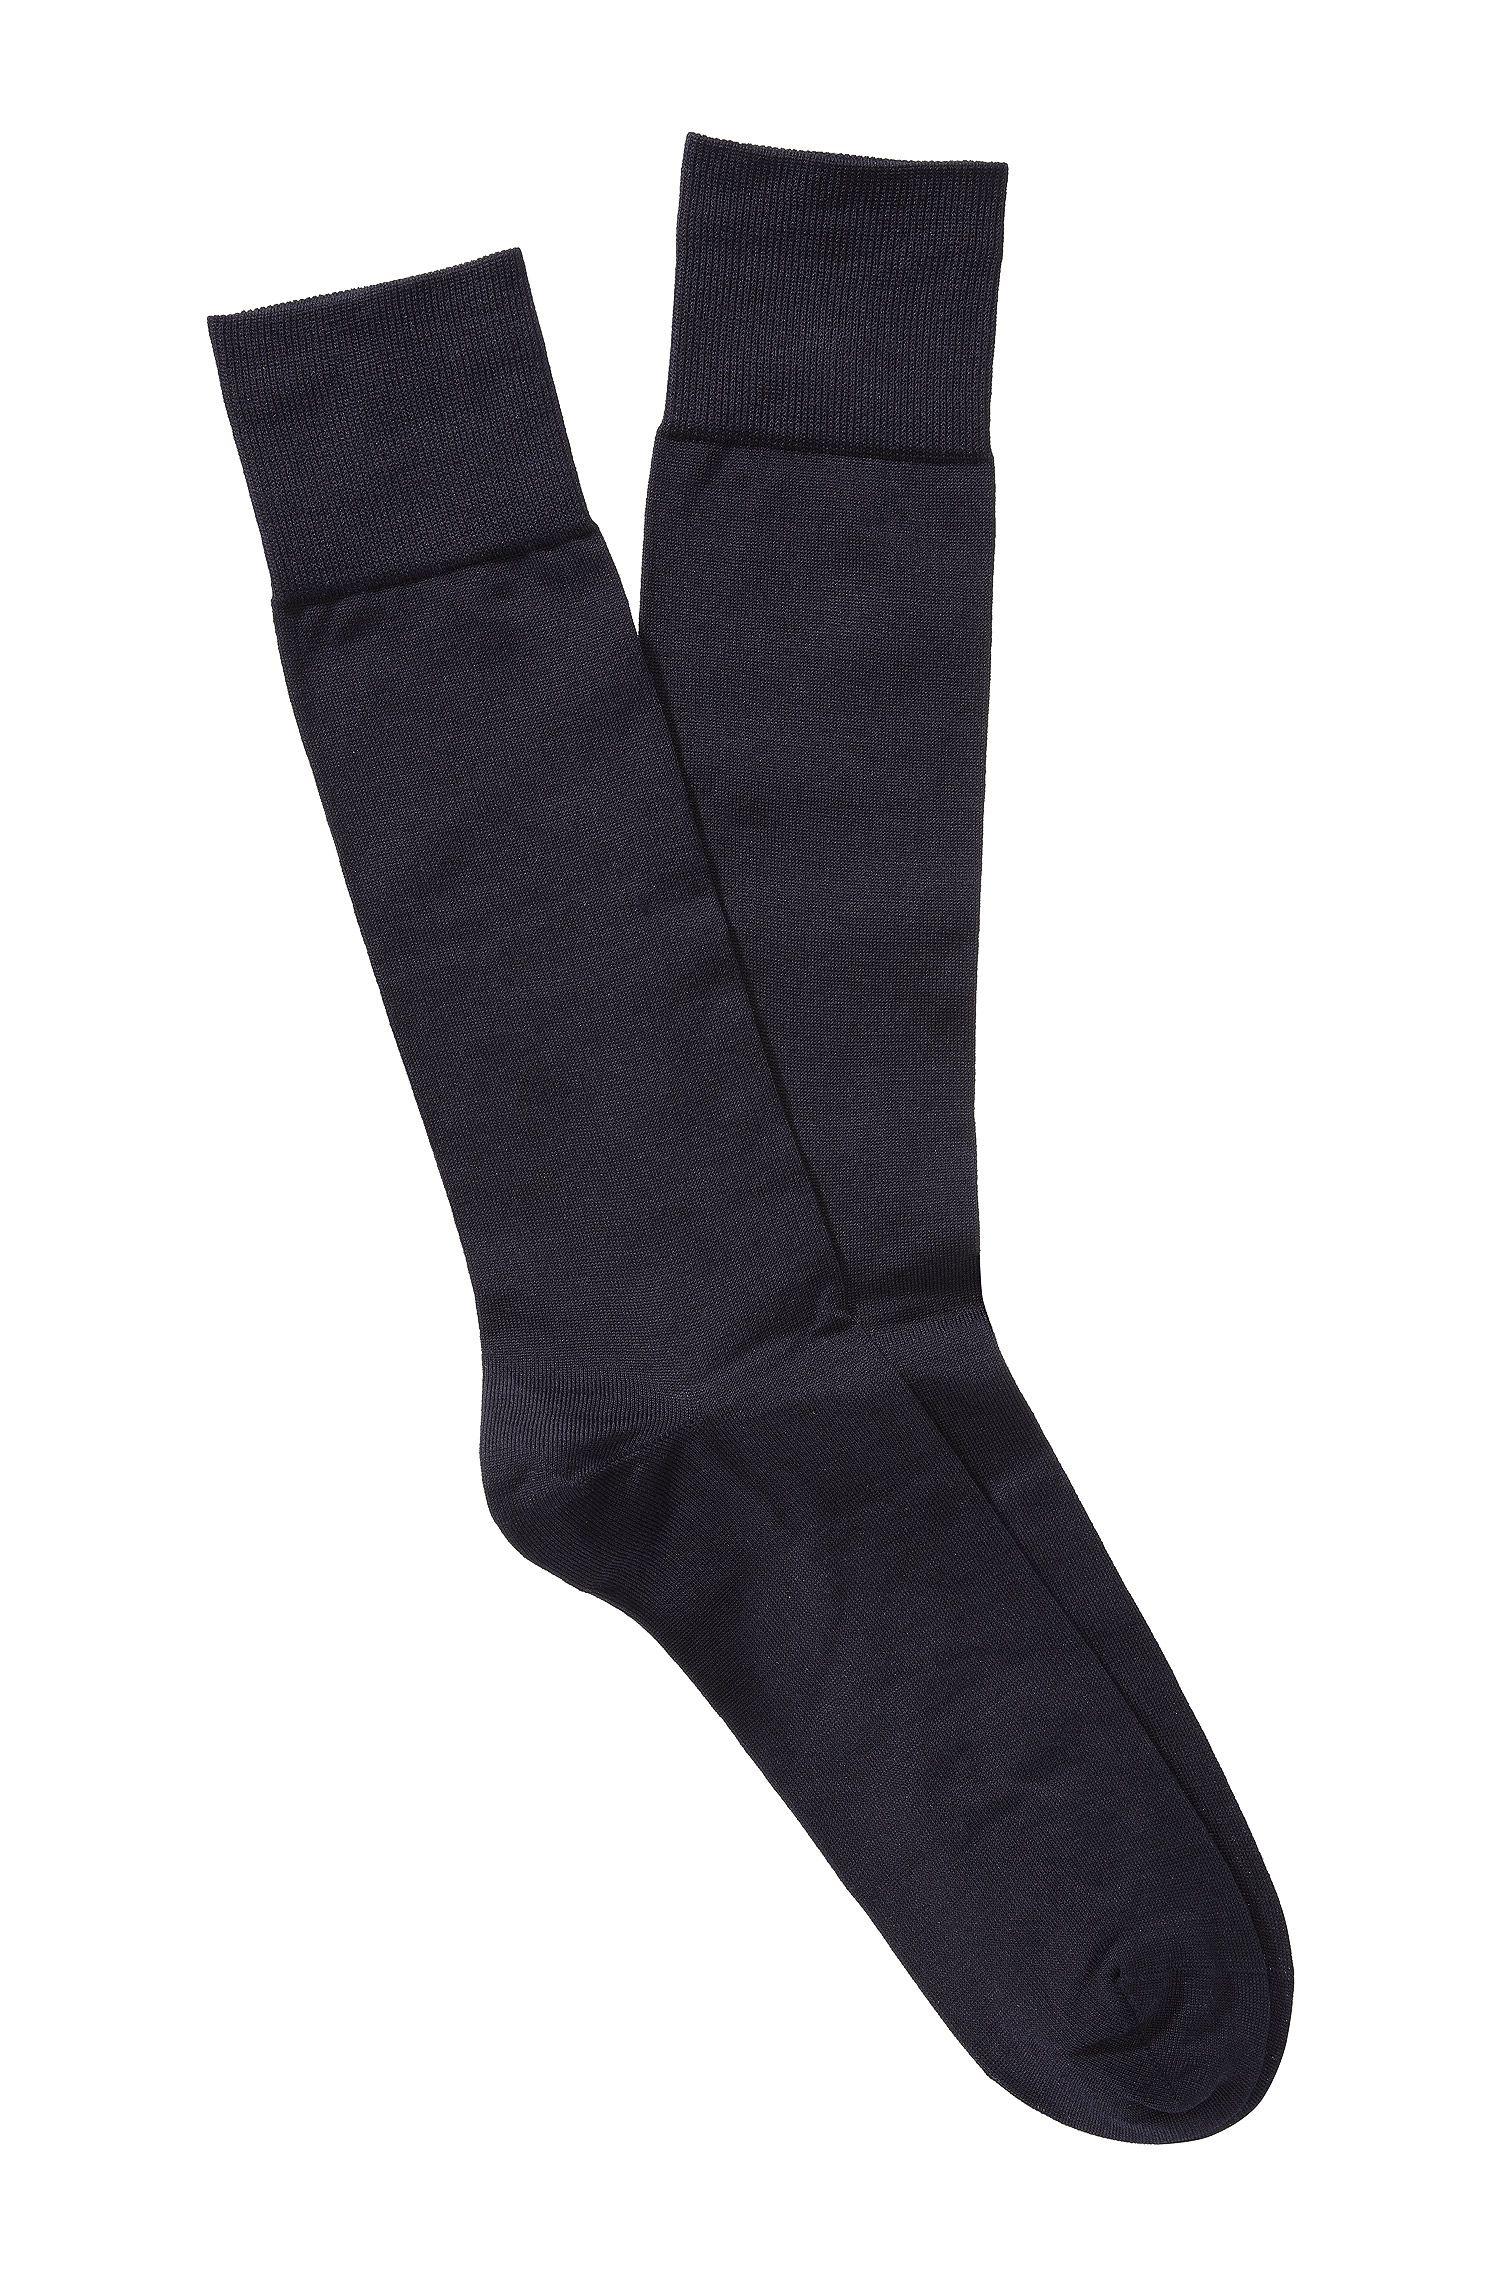 Socken ´TL Silk RS` aus Seidenkomposition